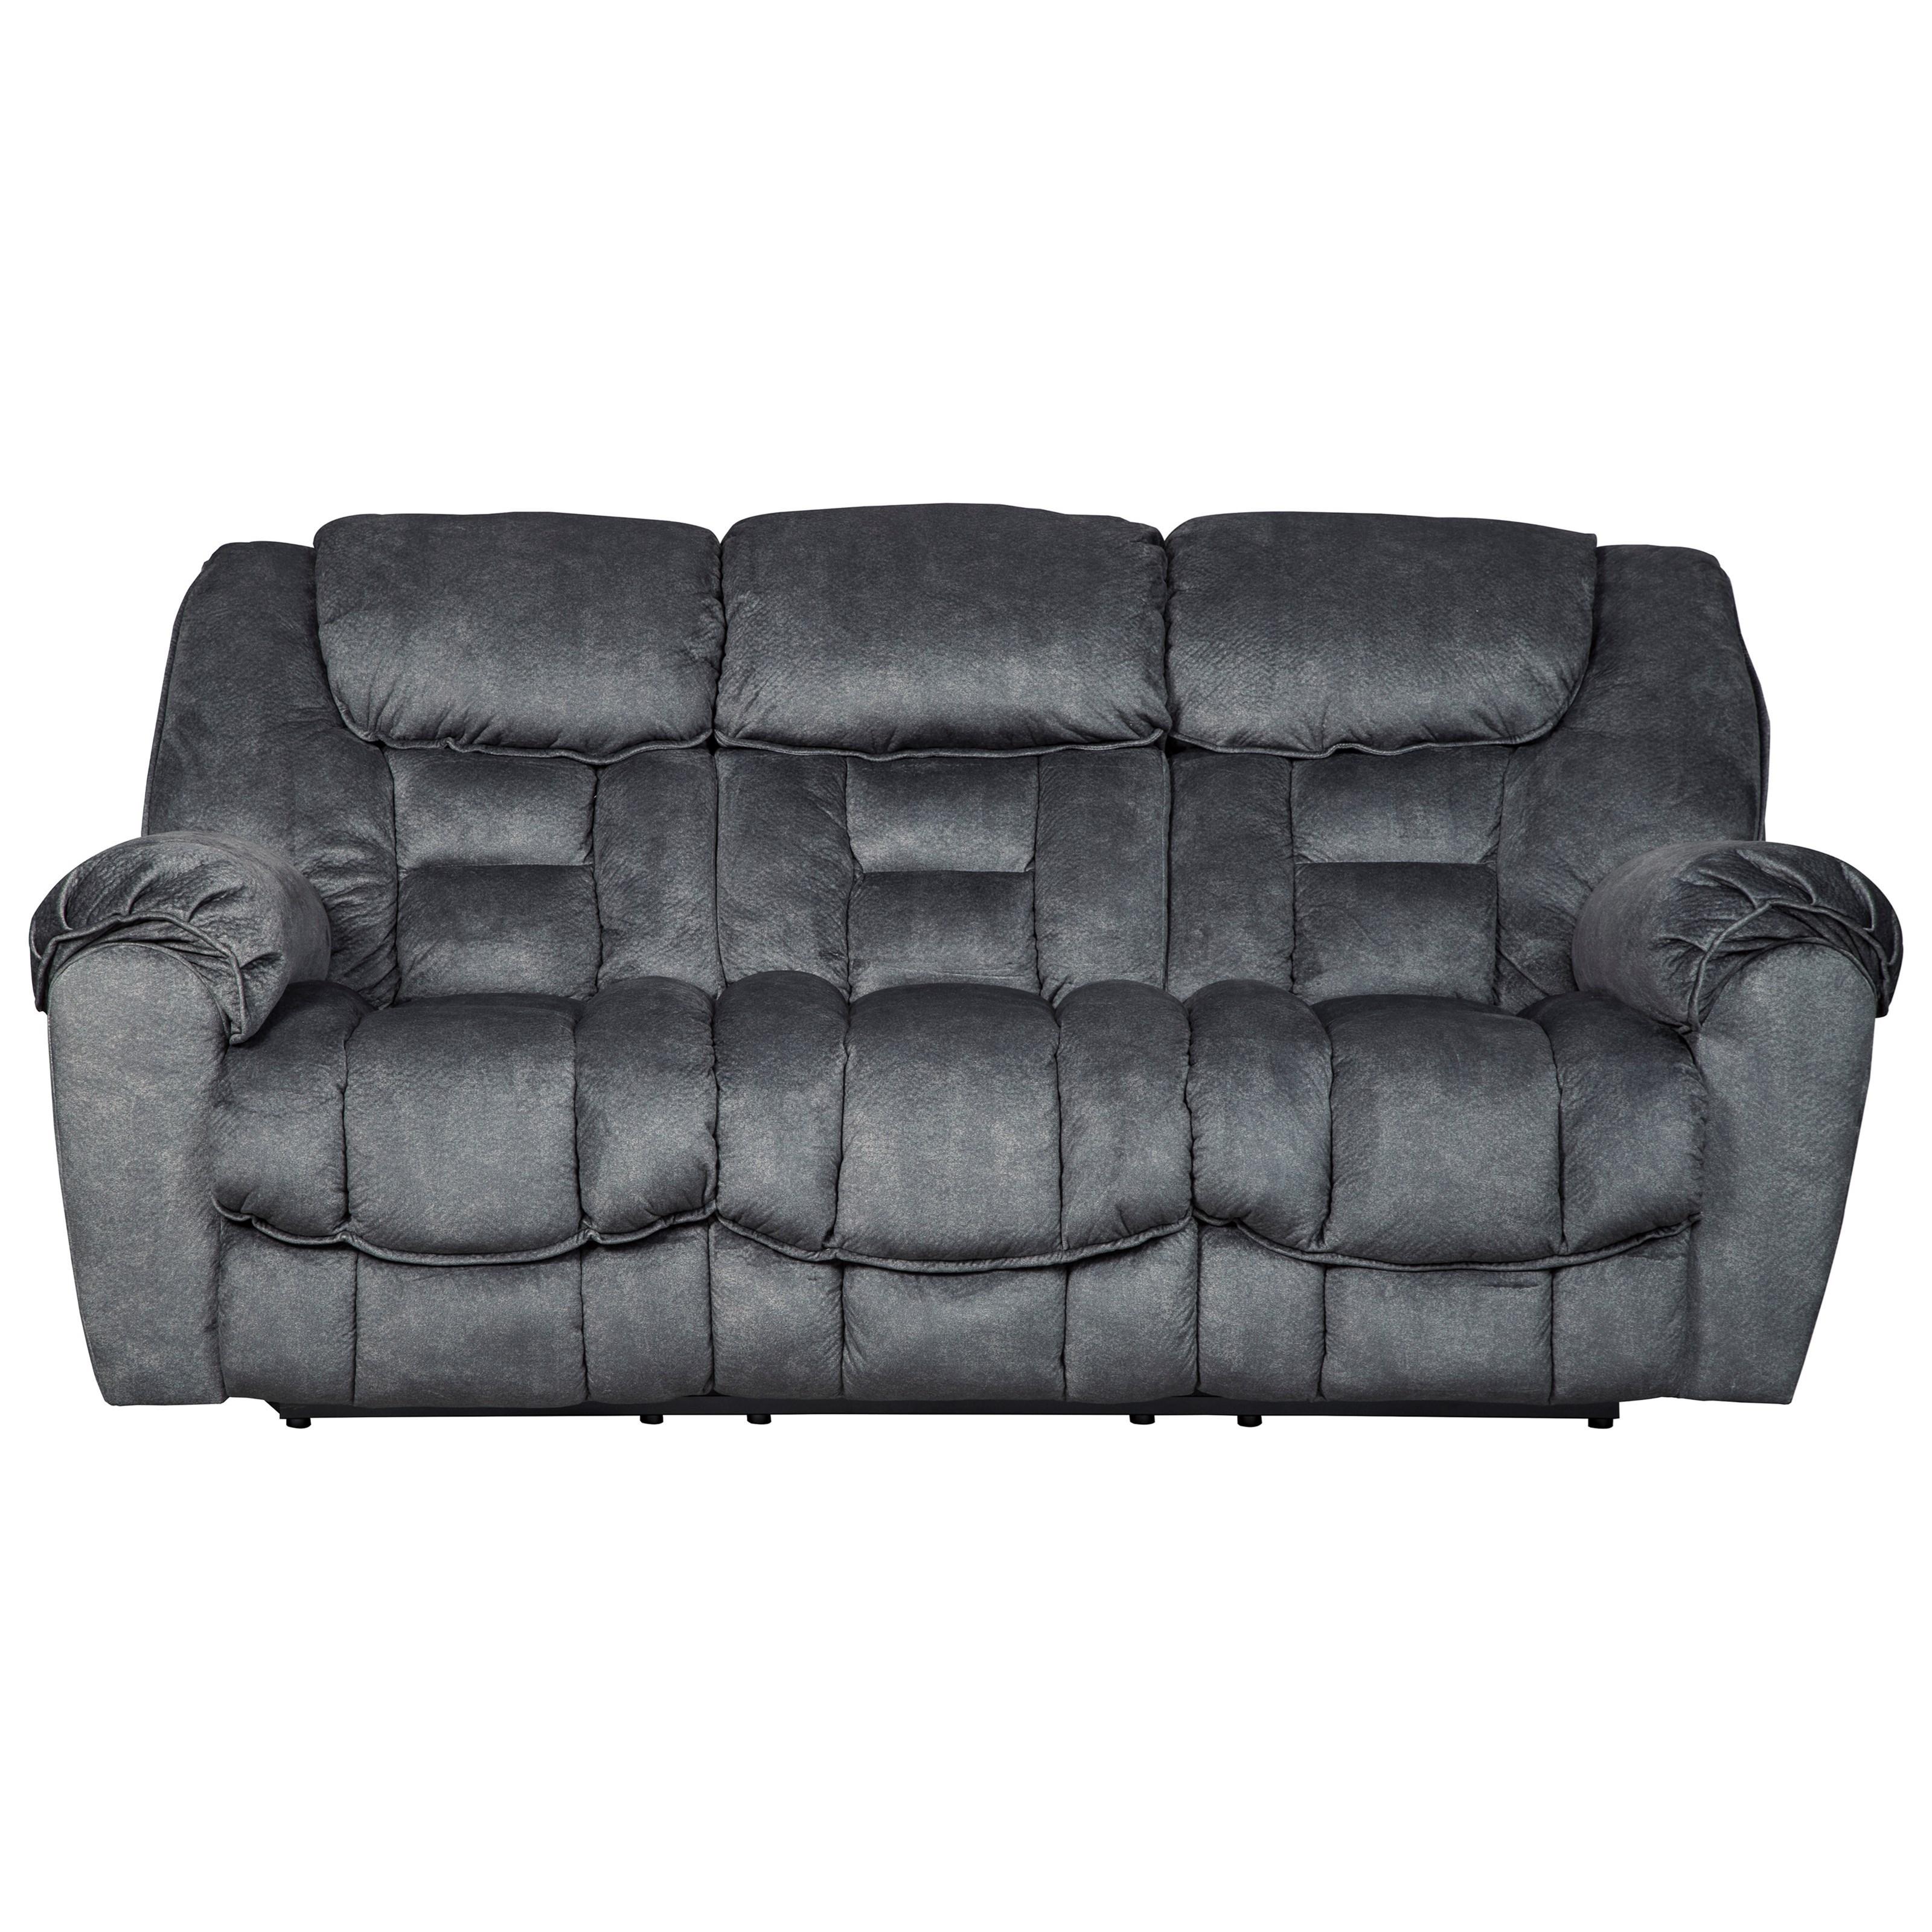 Casual Contemporary Reclining Sofa